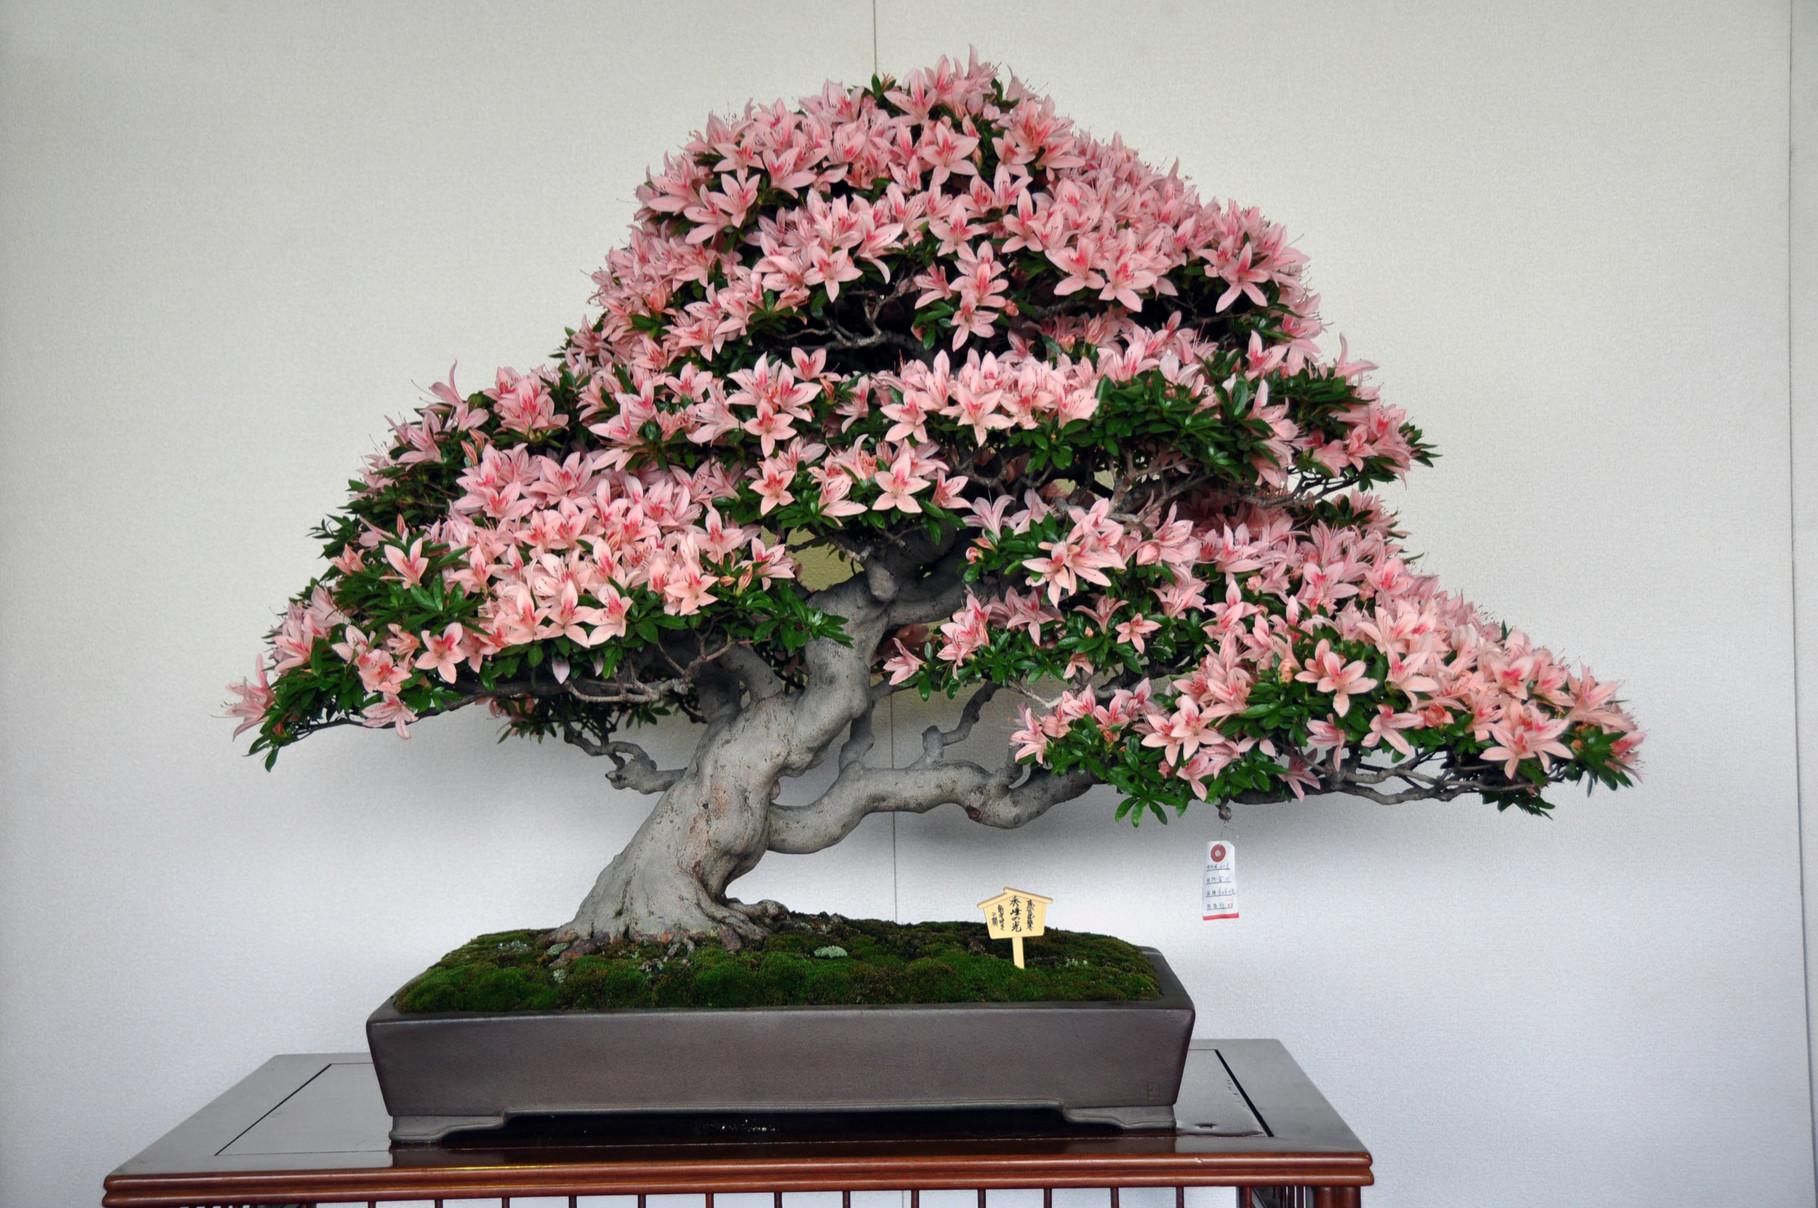 Tochigi Prefecture Award, Cultivar Shuho-no-Hikari